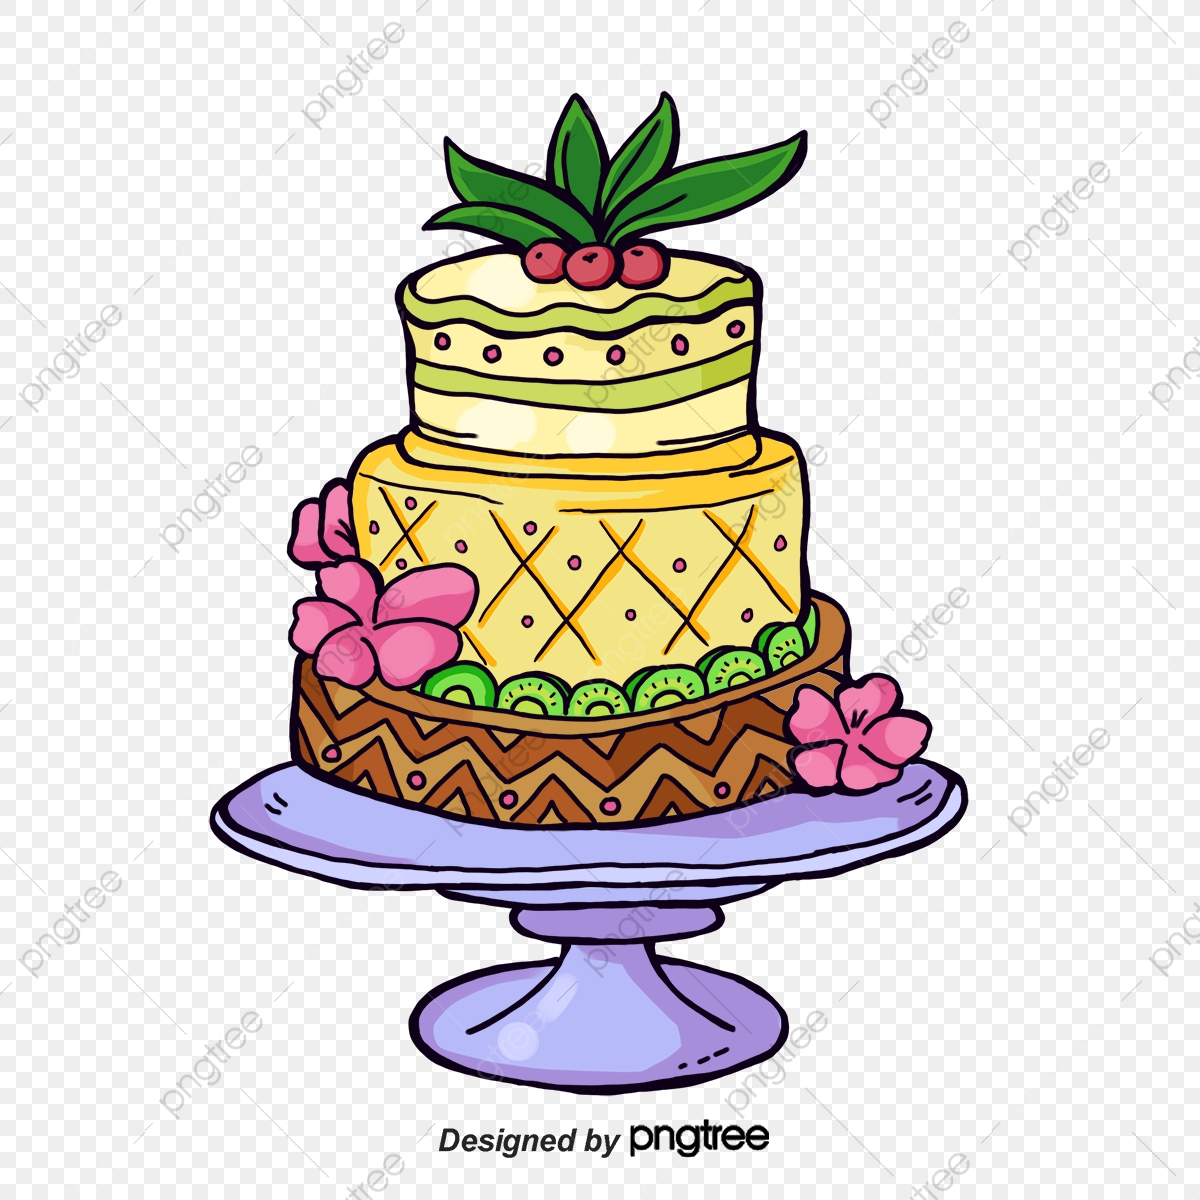 Watercolor . Cake clipart cake design